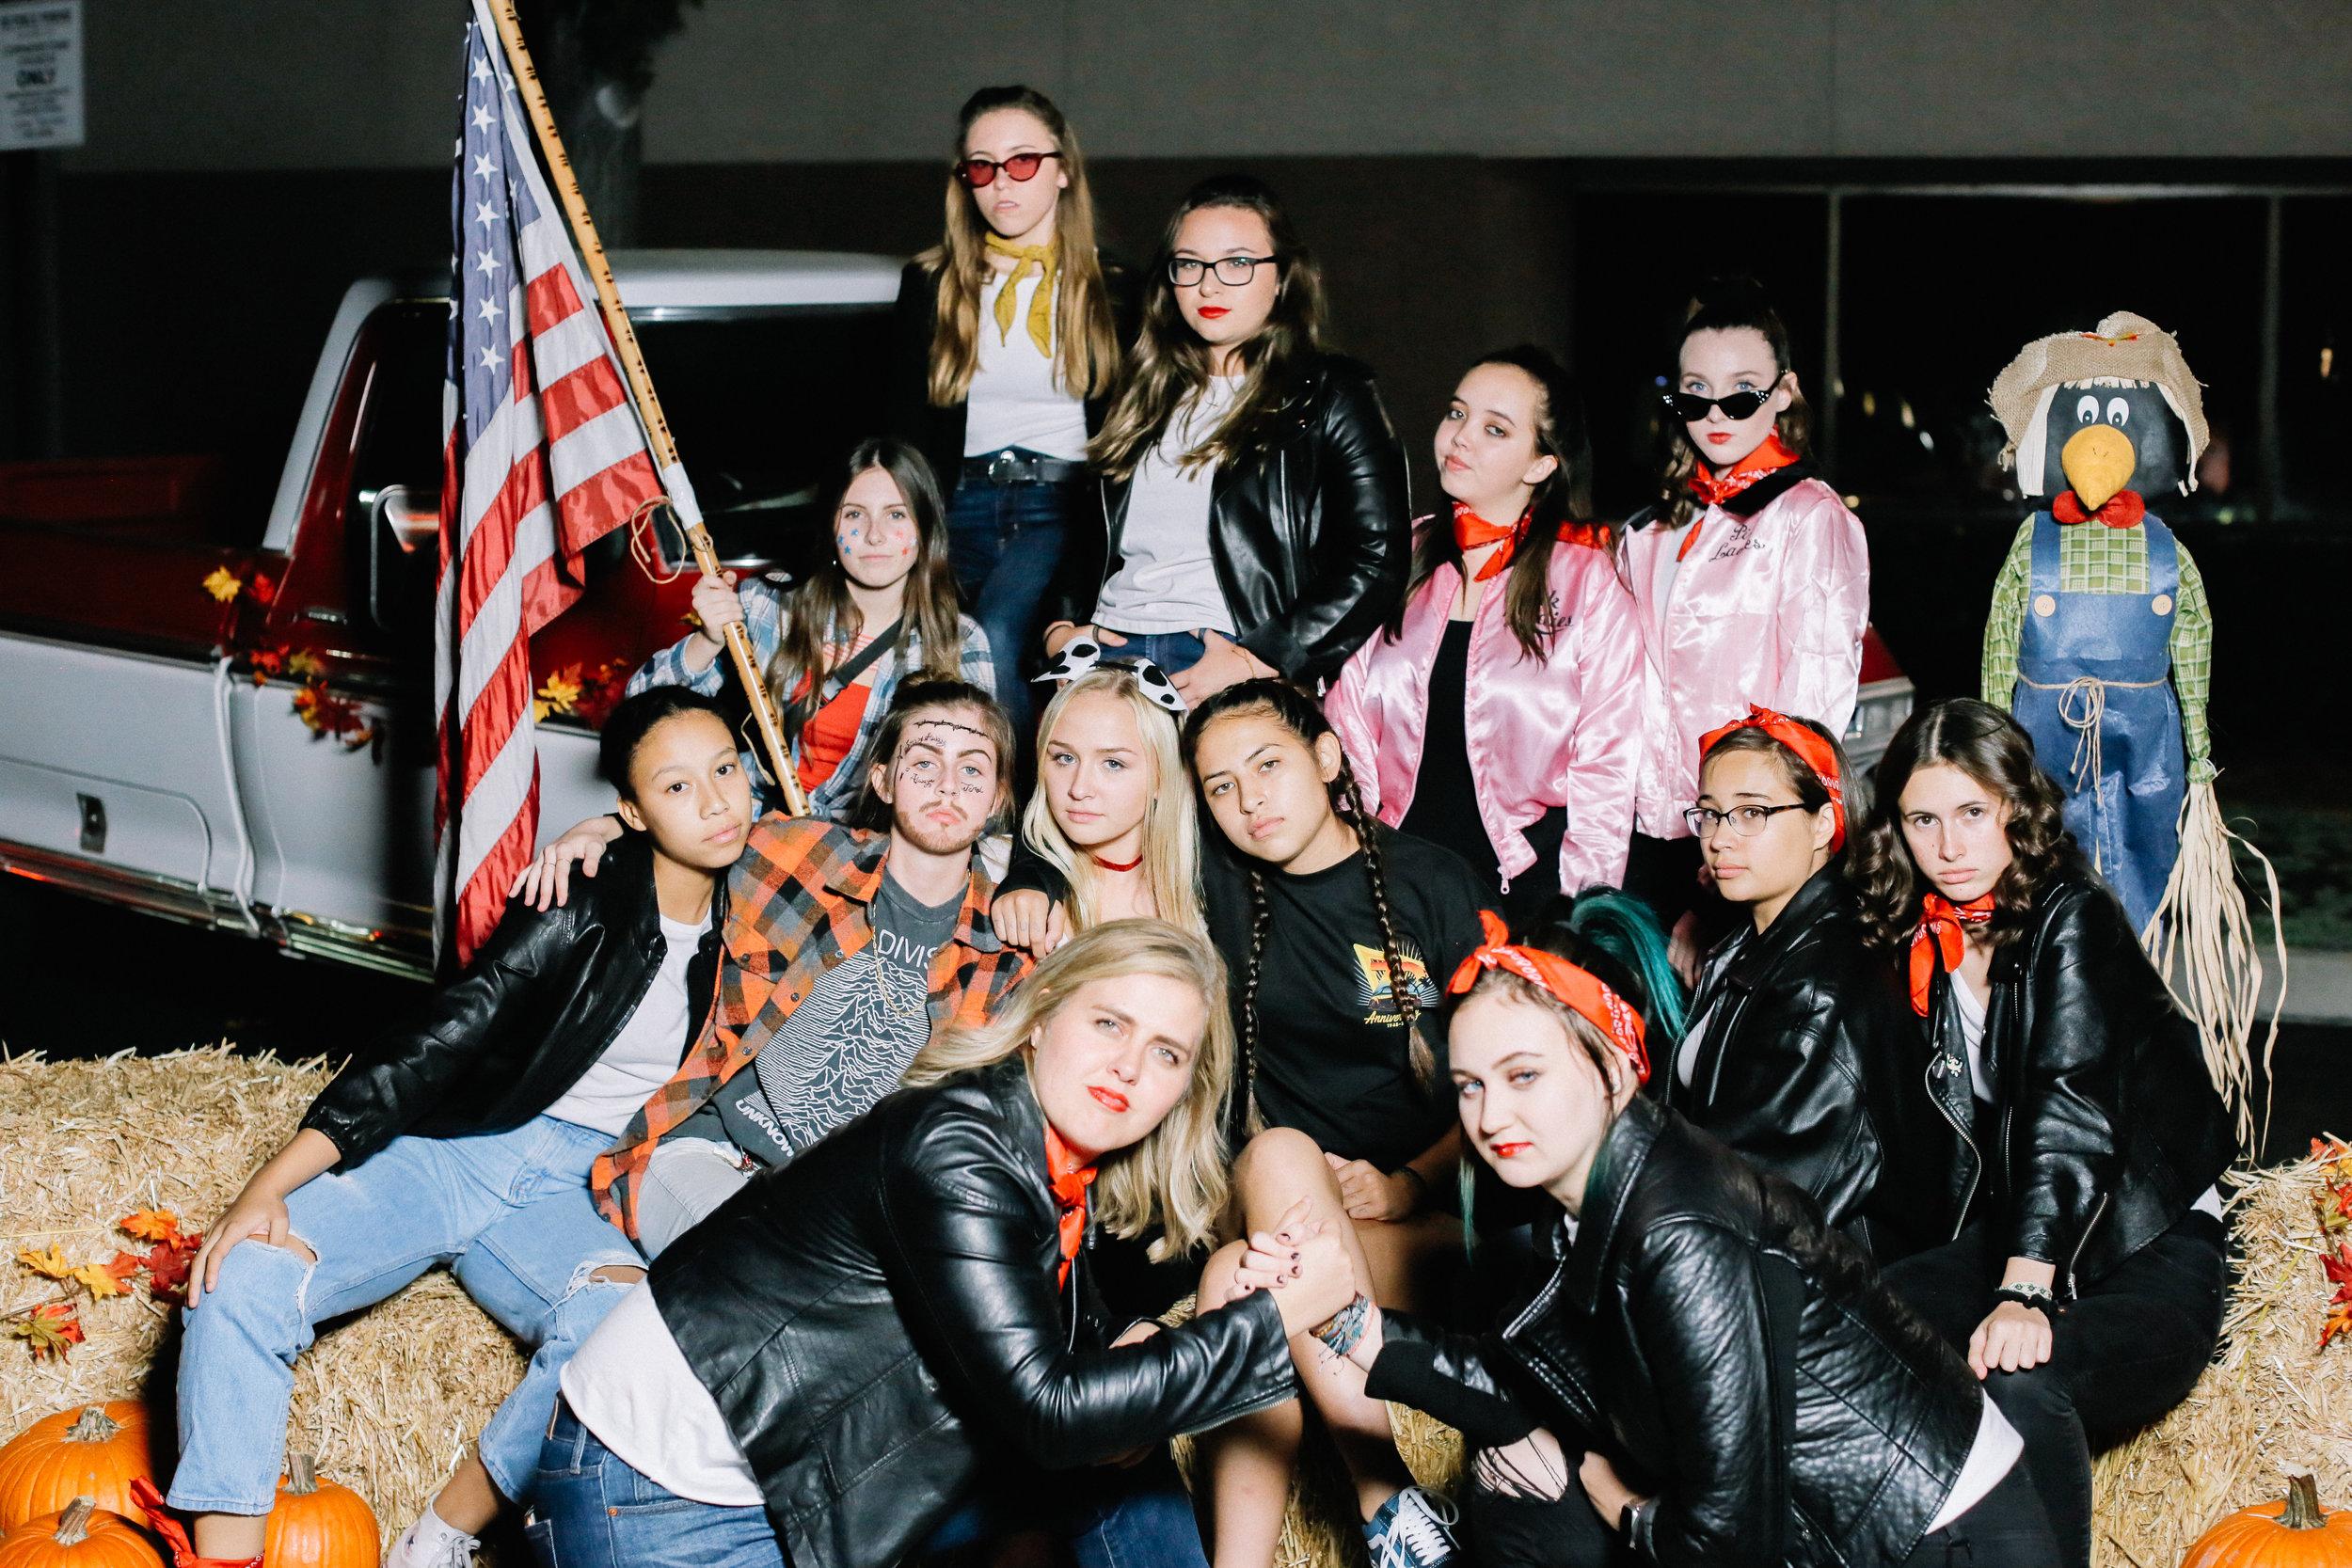 Pumpkin Carving Party 2018 - Fall 2018